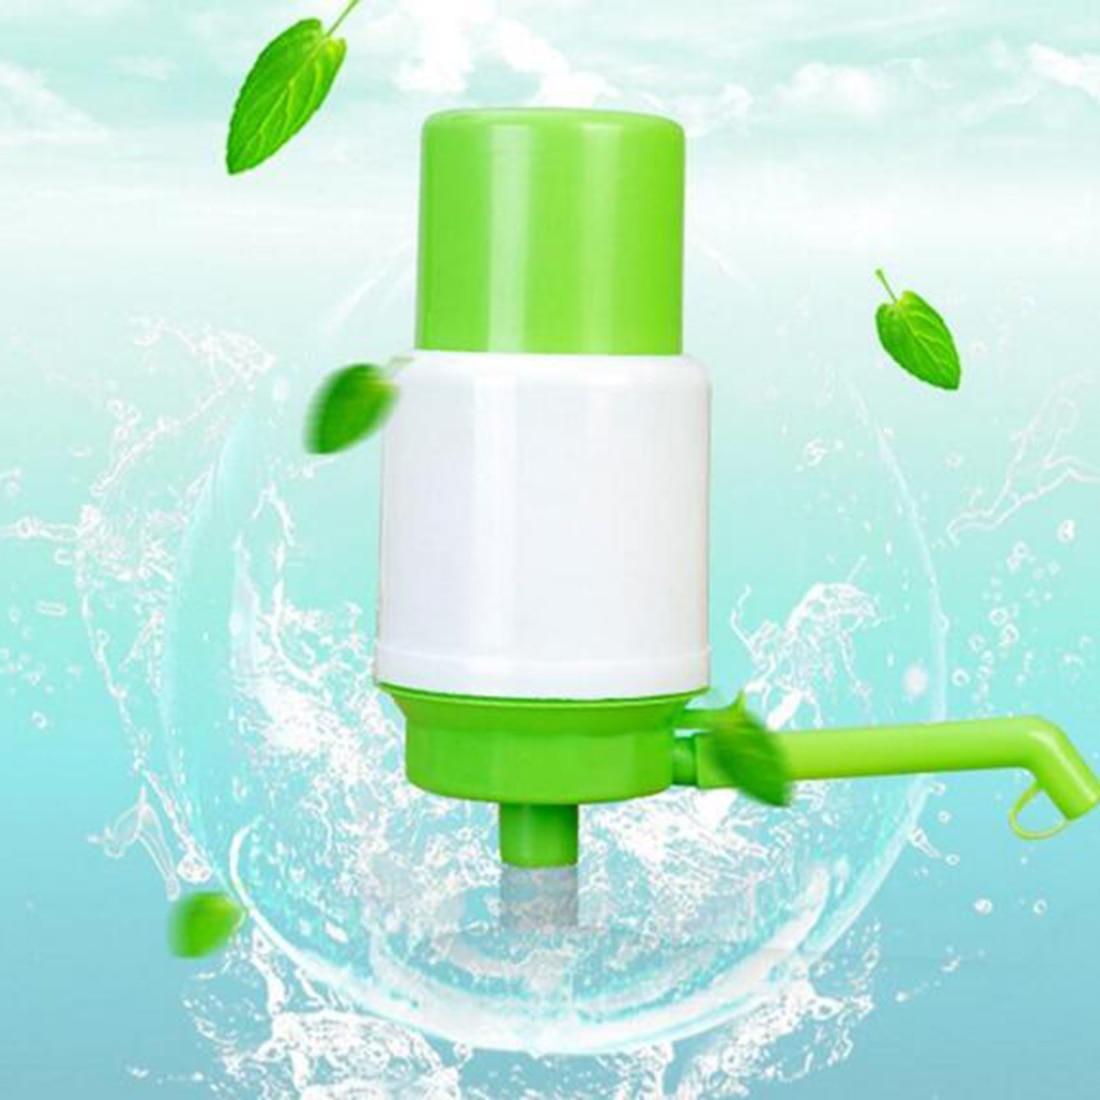 Best Seller Random Color Household Manual Water Bottle/Jug Hand Pump Hand Press Dispenser 5